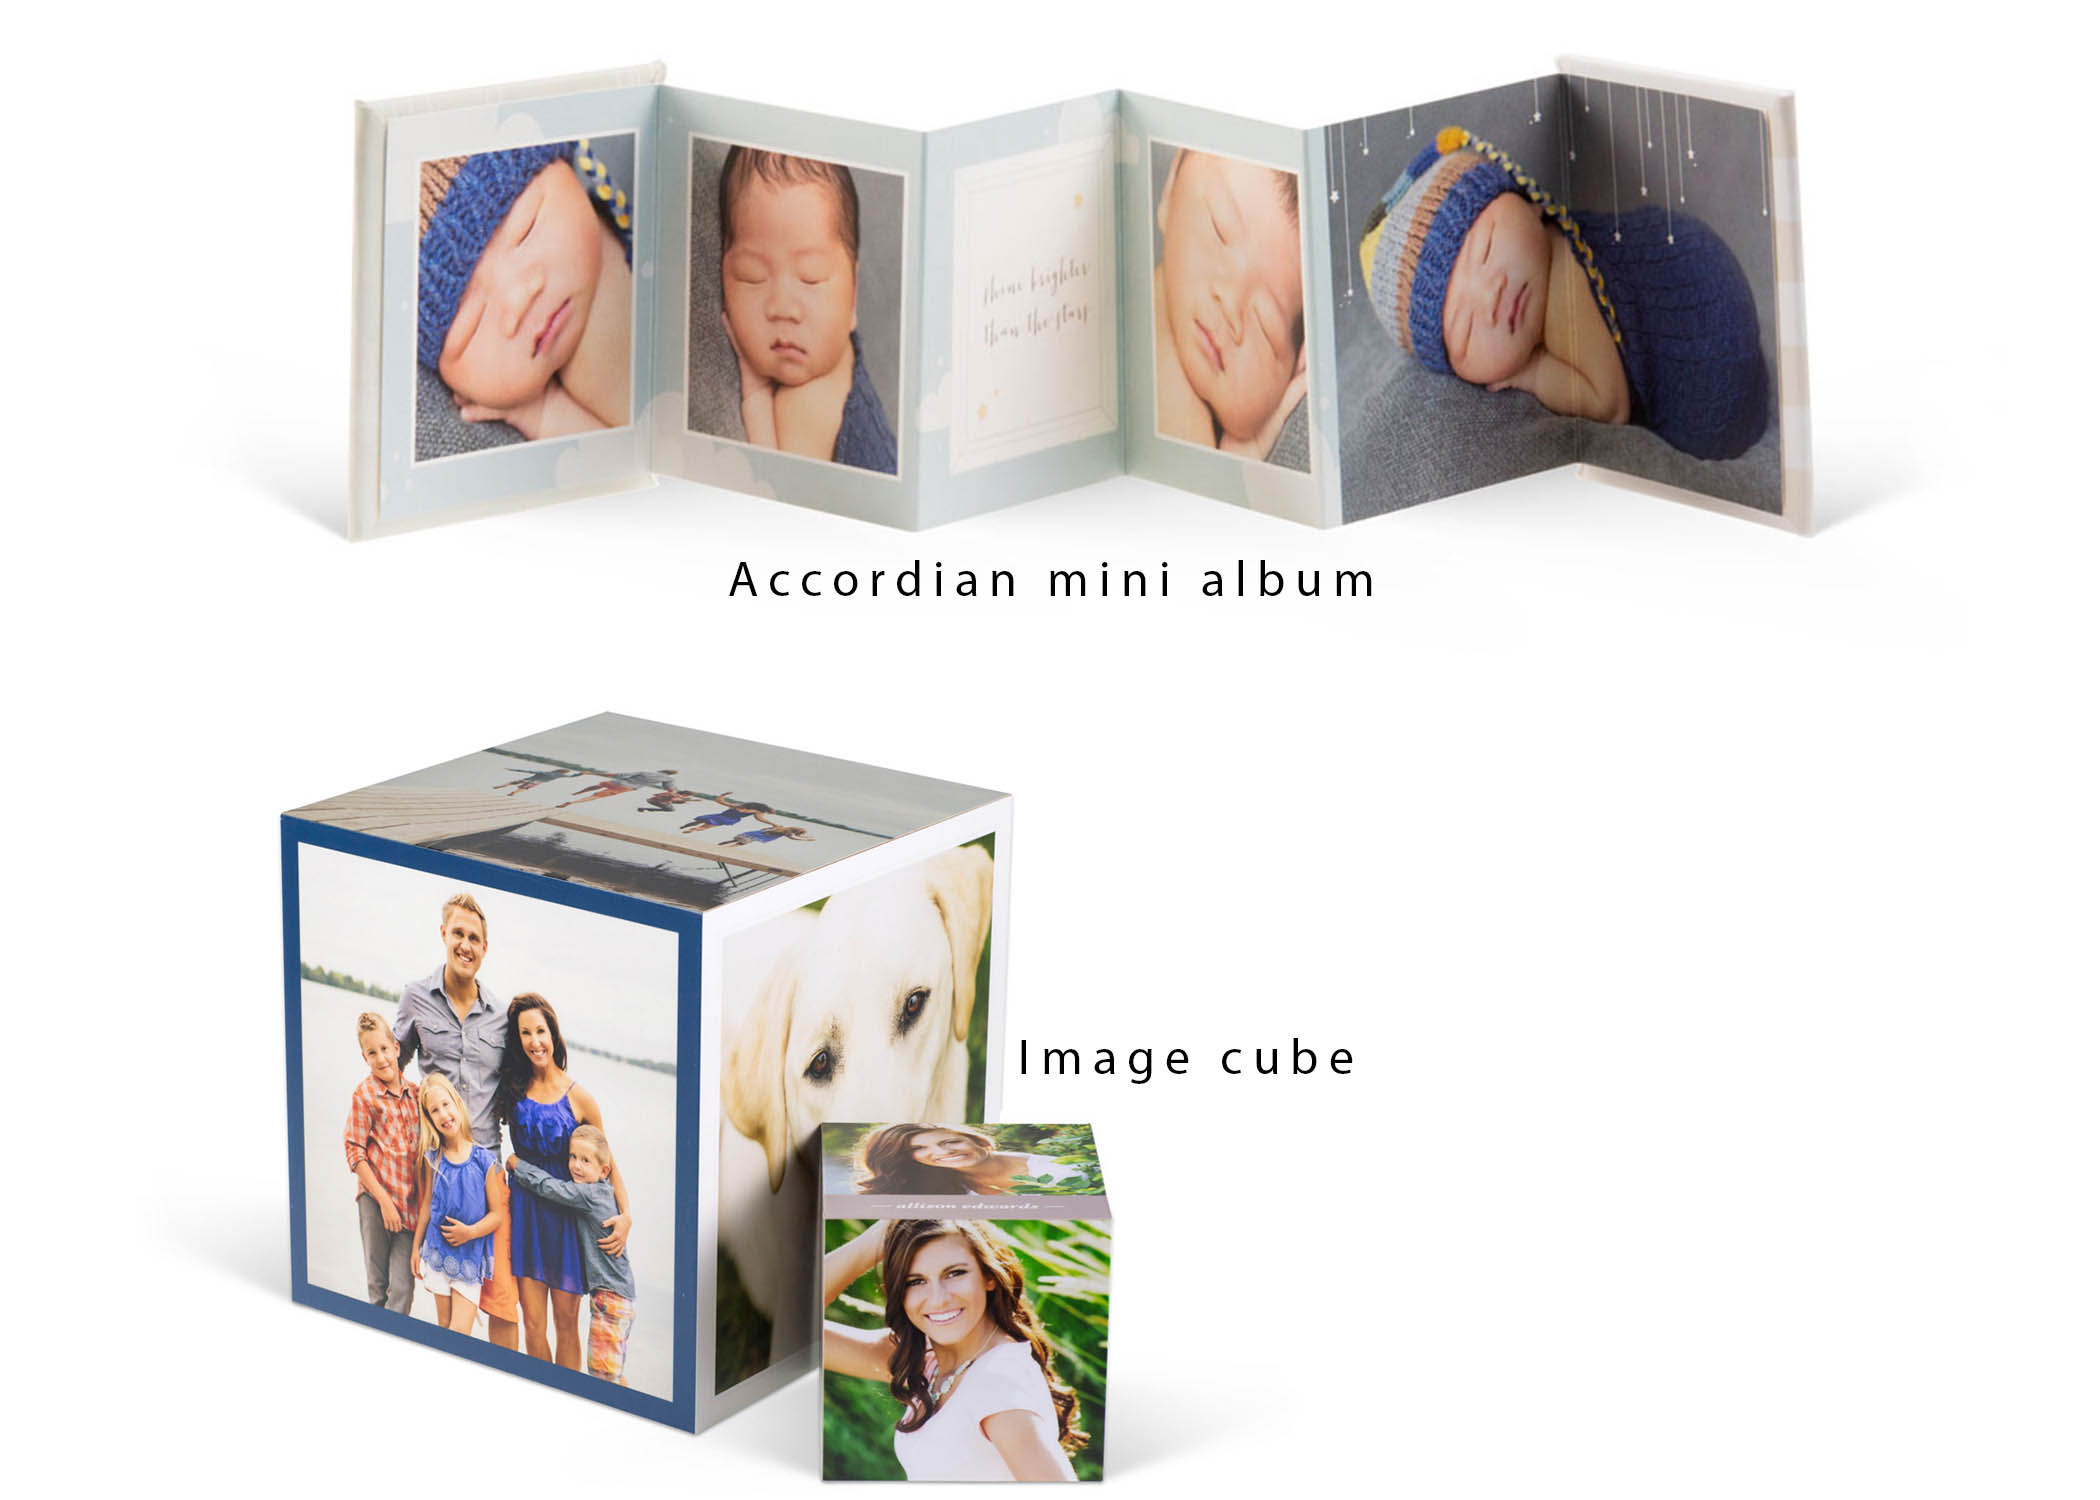 accordian image cube.jpg